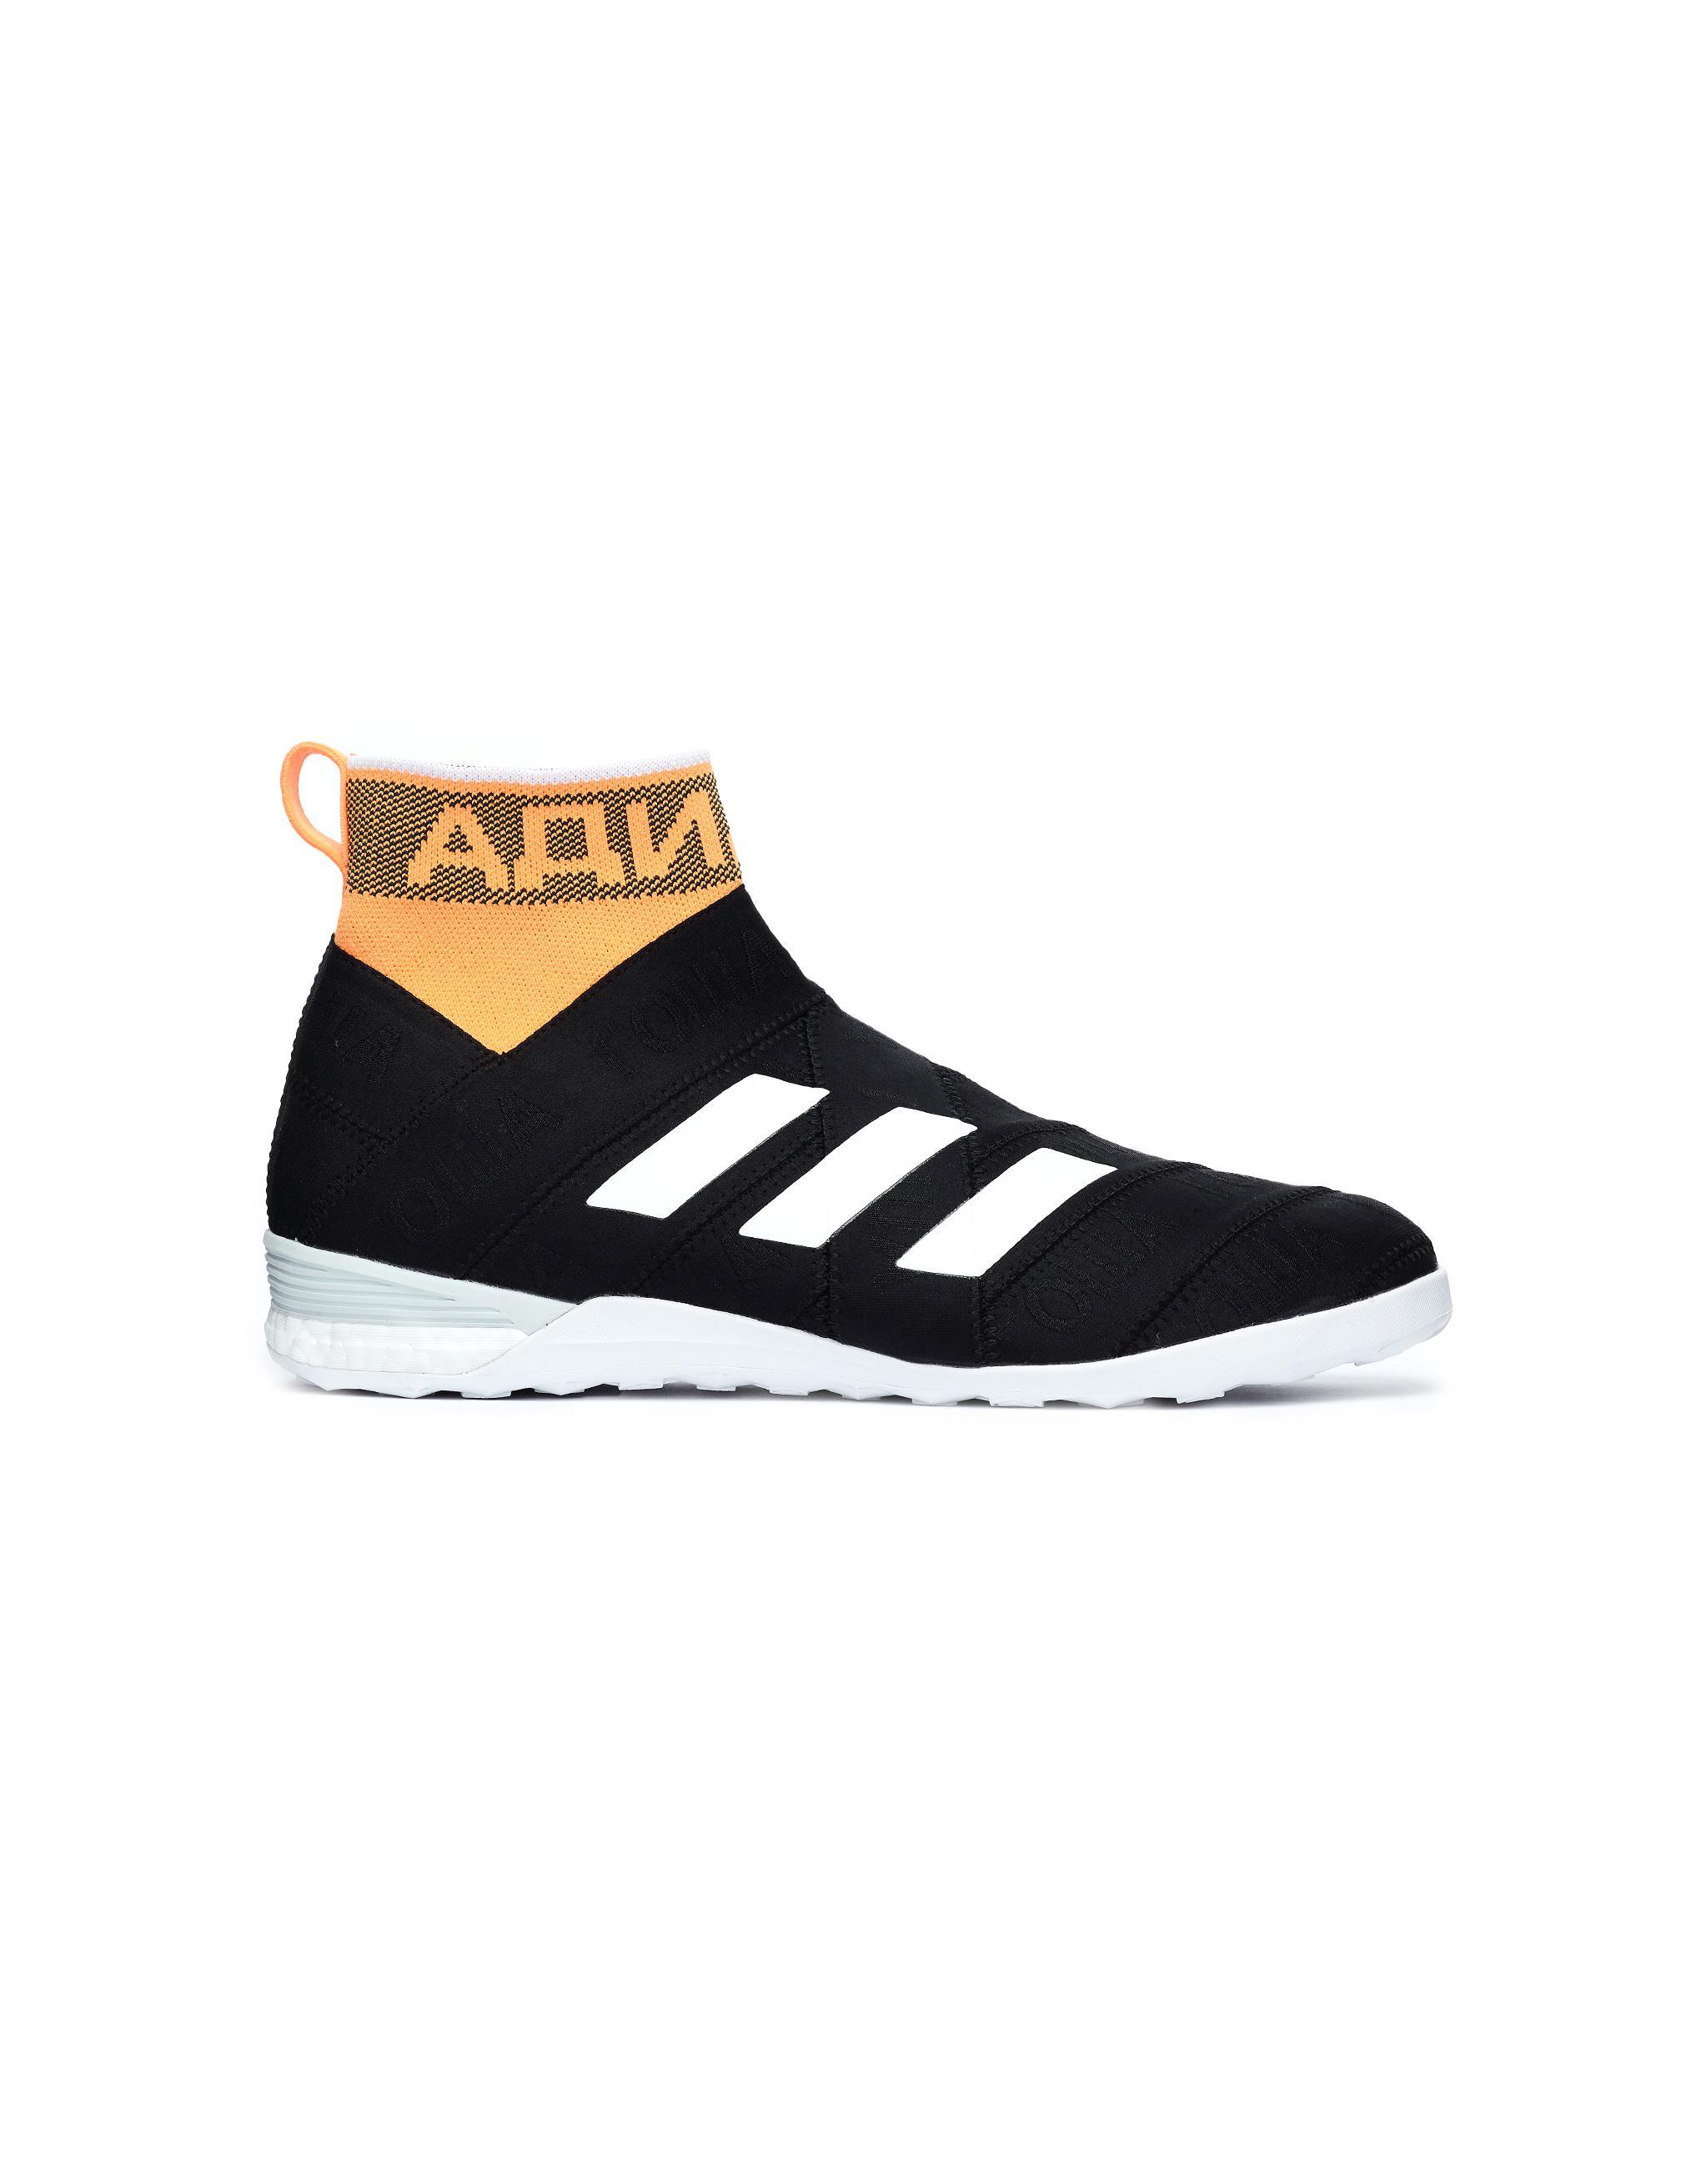 139abf385c4a Gosha Rubchinskiy High-top Nemeziz Sneakers in Black for Men - Save ...